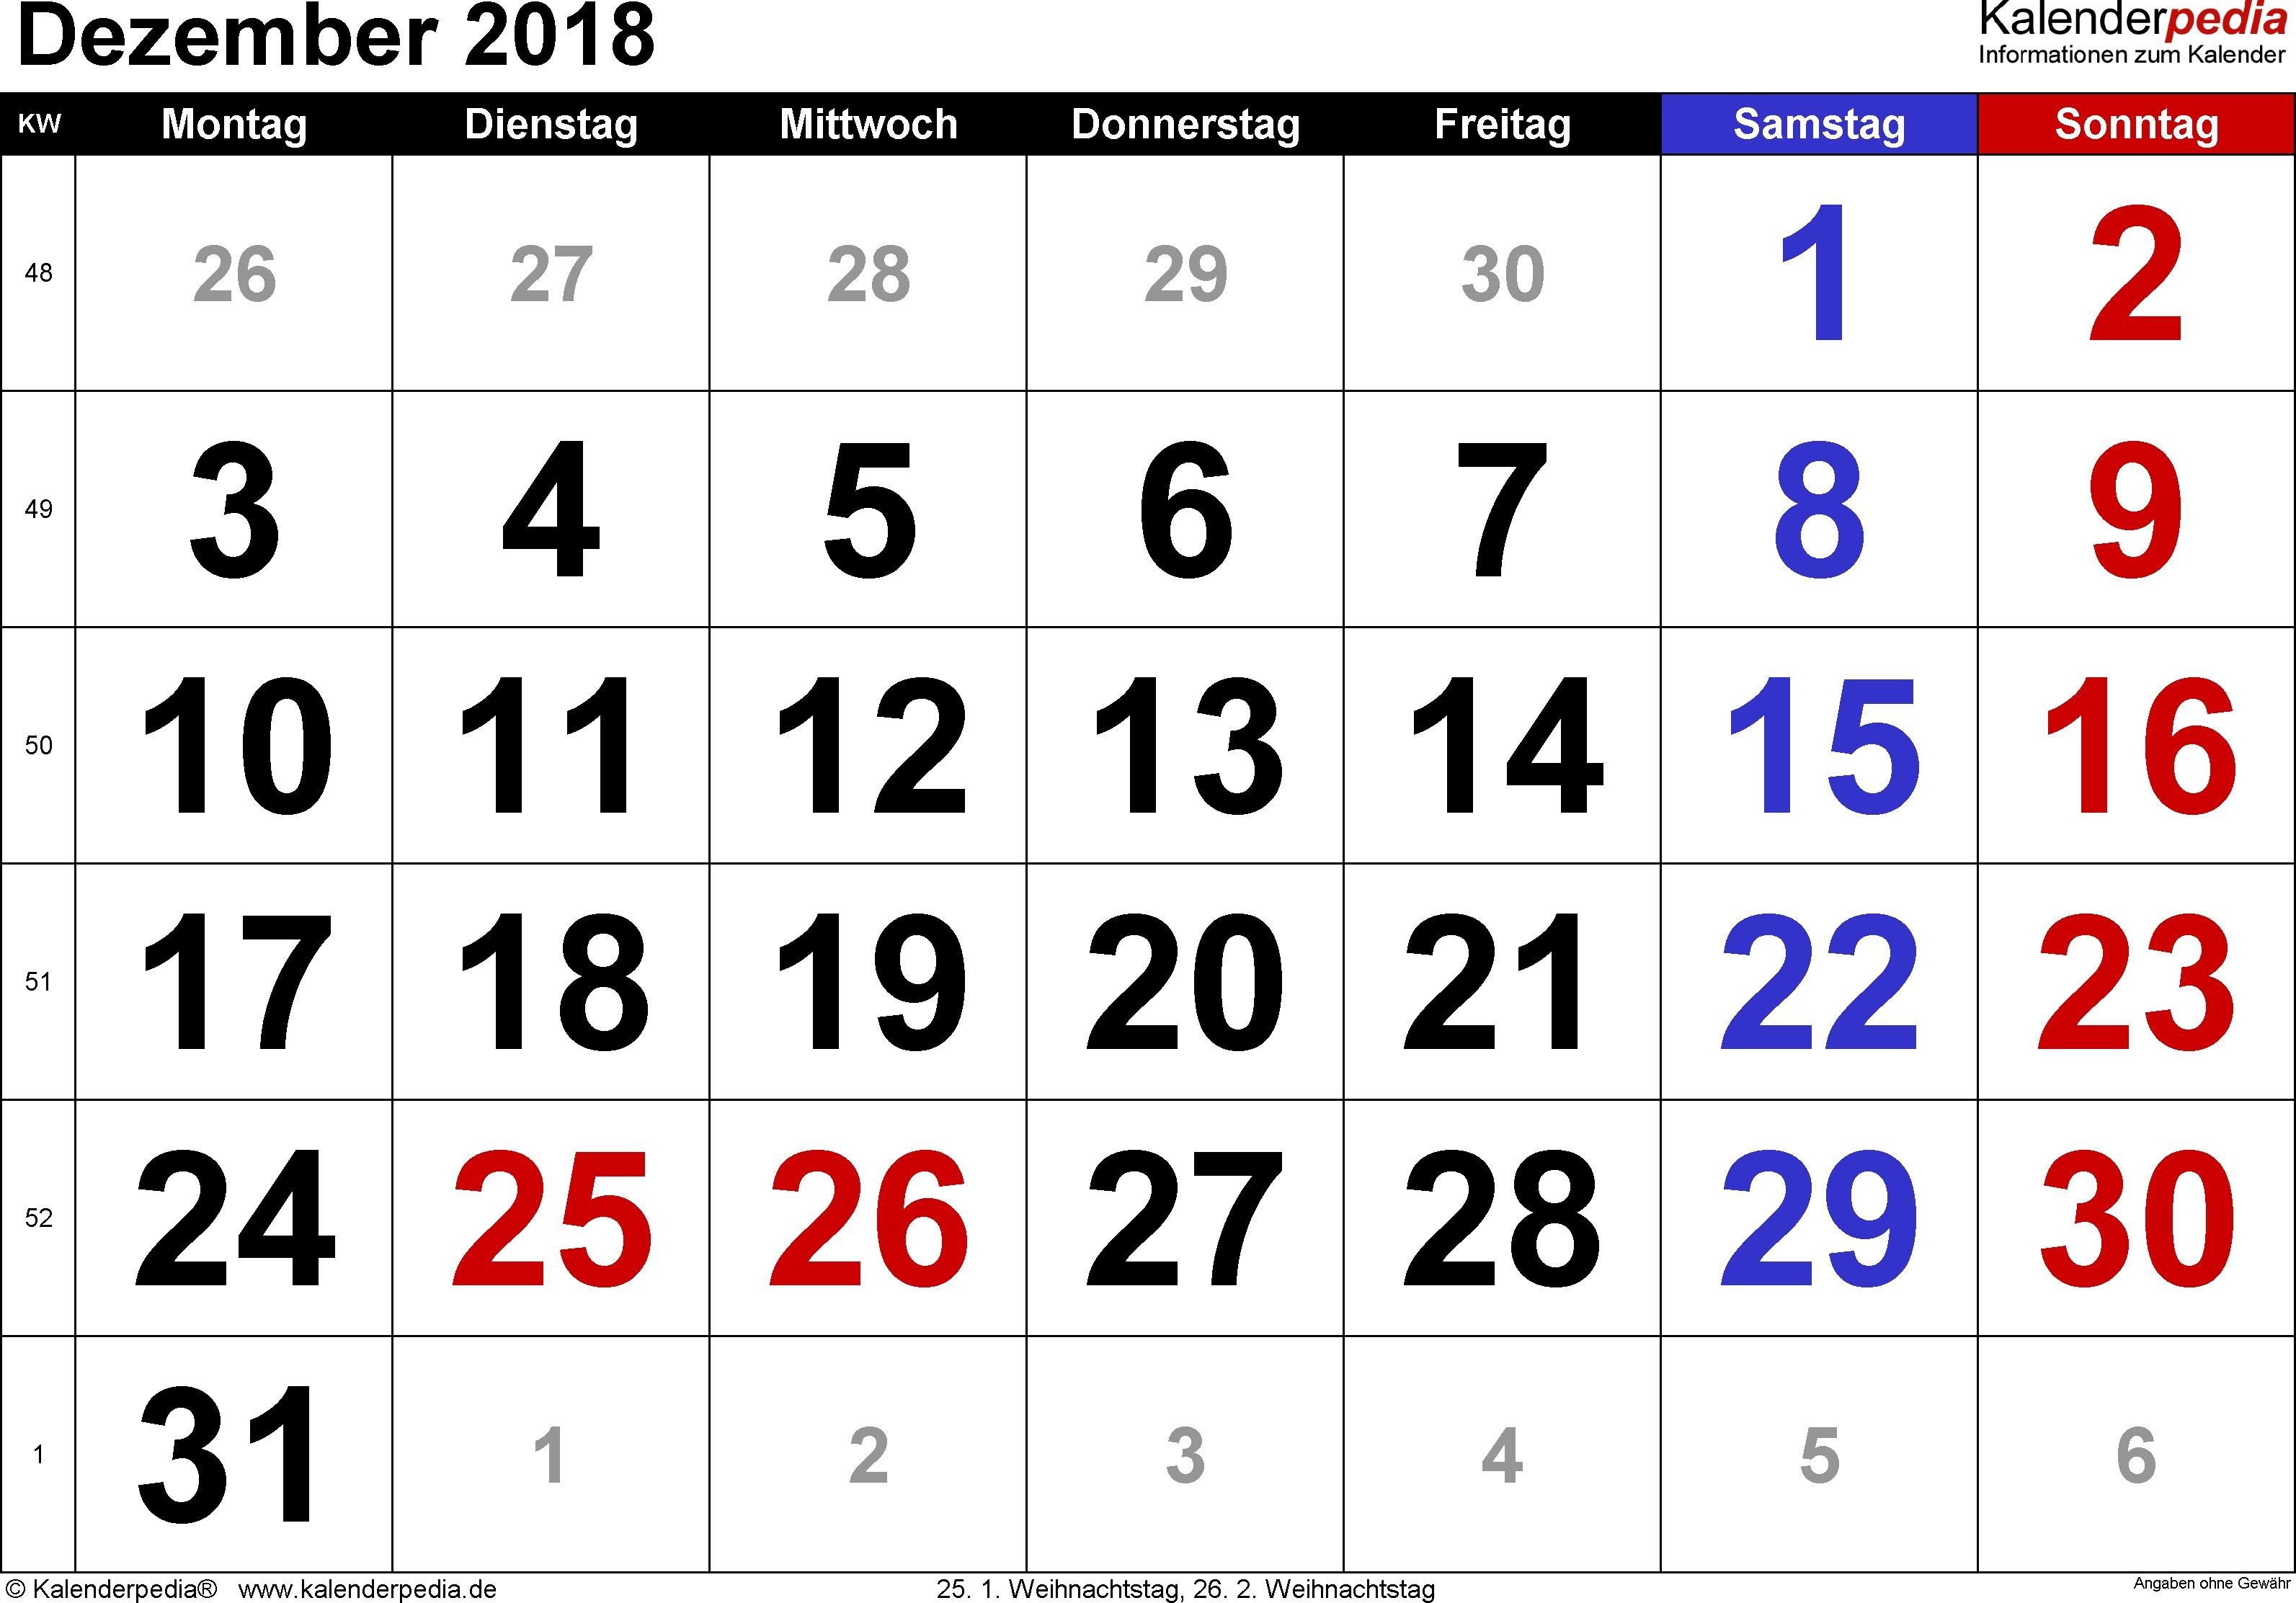 Calendario 2017 Para Imprimir Con Feriados Colombia Recientes Prueba Kalender 2019 Ferien Bayern Pdf Of Calendario 2017 Para Imprimir Con Feriados Colombia Más Actual Calendrio Lunar 2018 Fases Da Lua 2018 Ideinhas Diy T